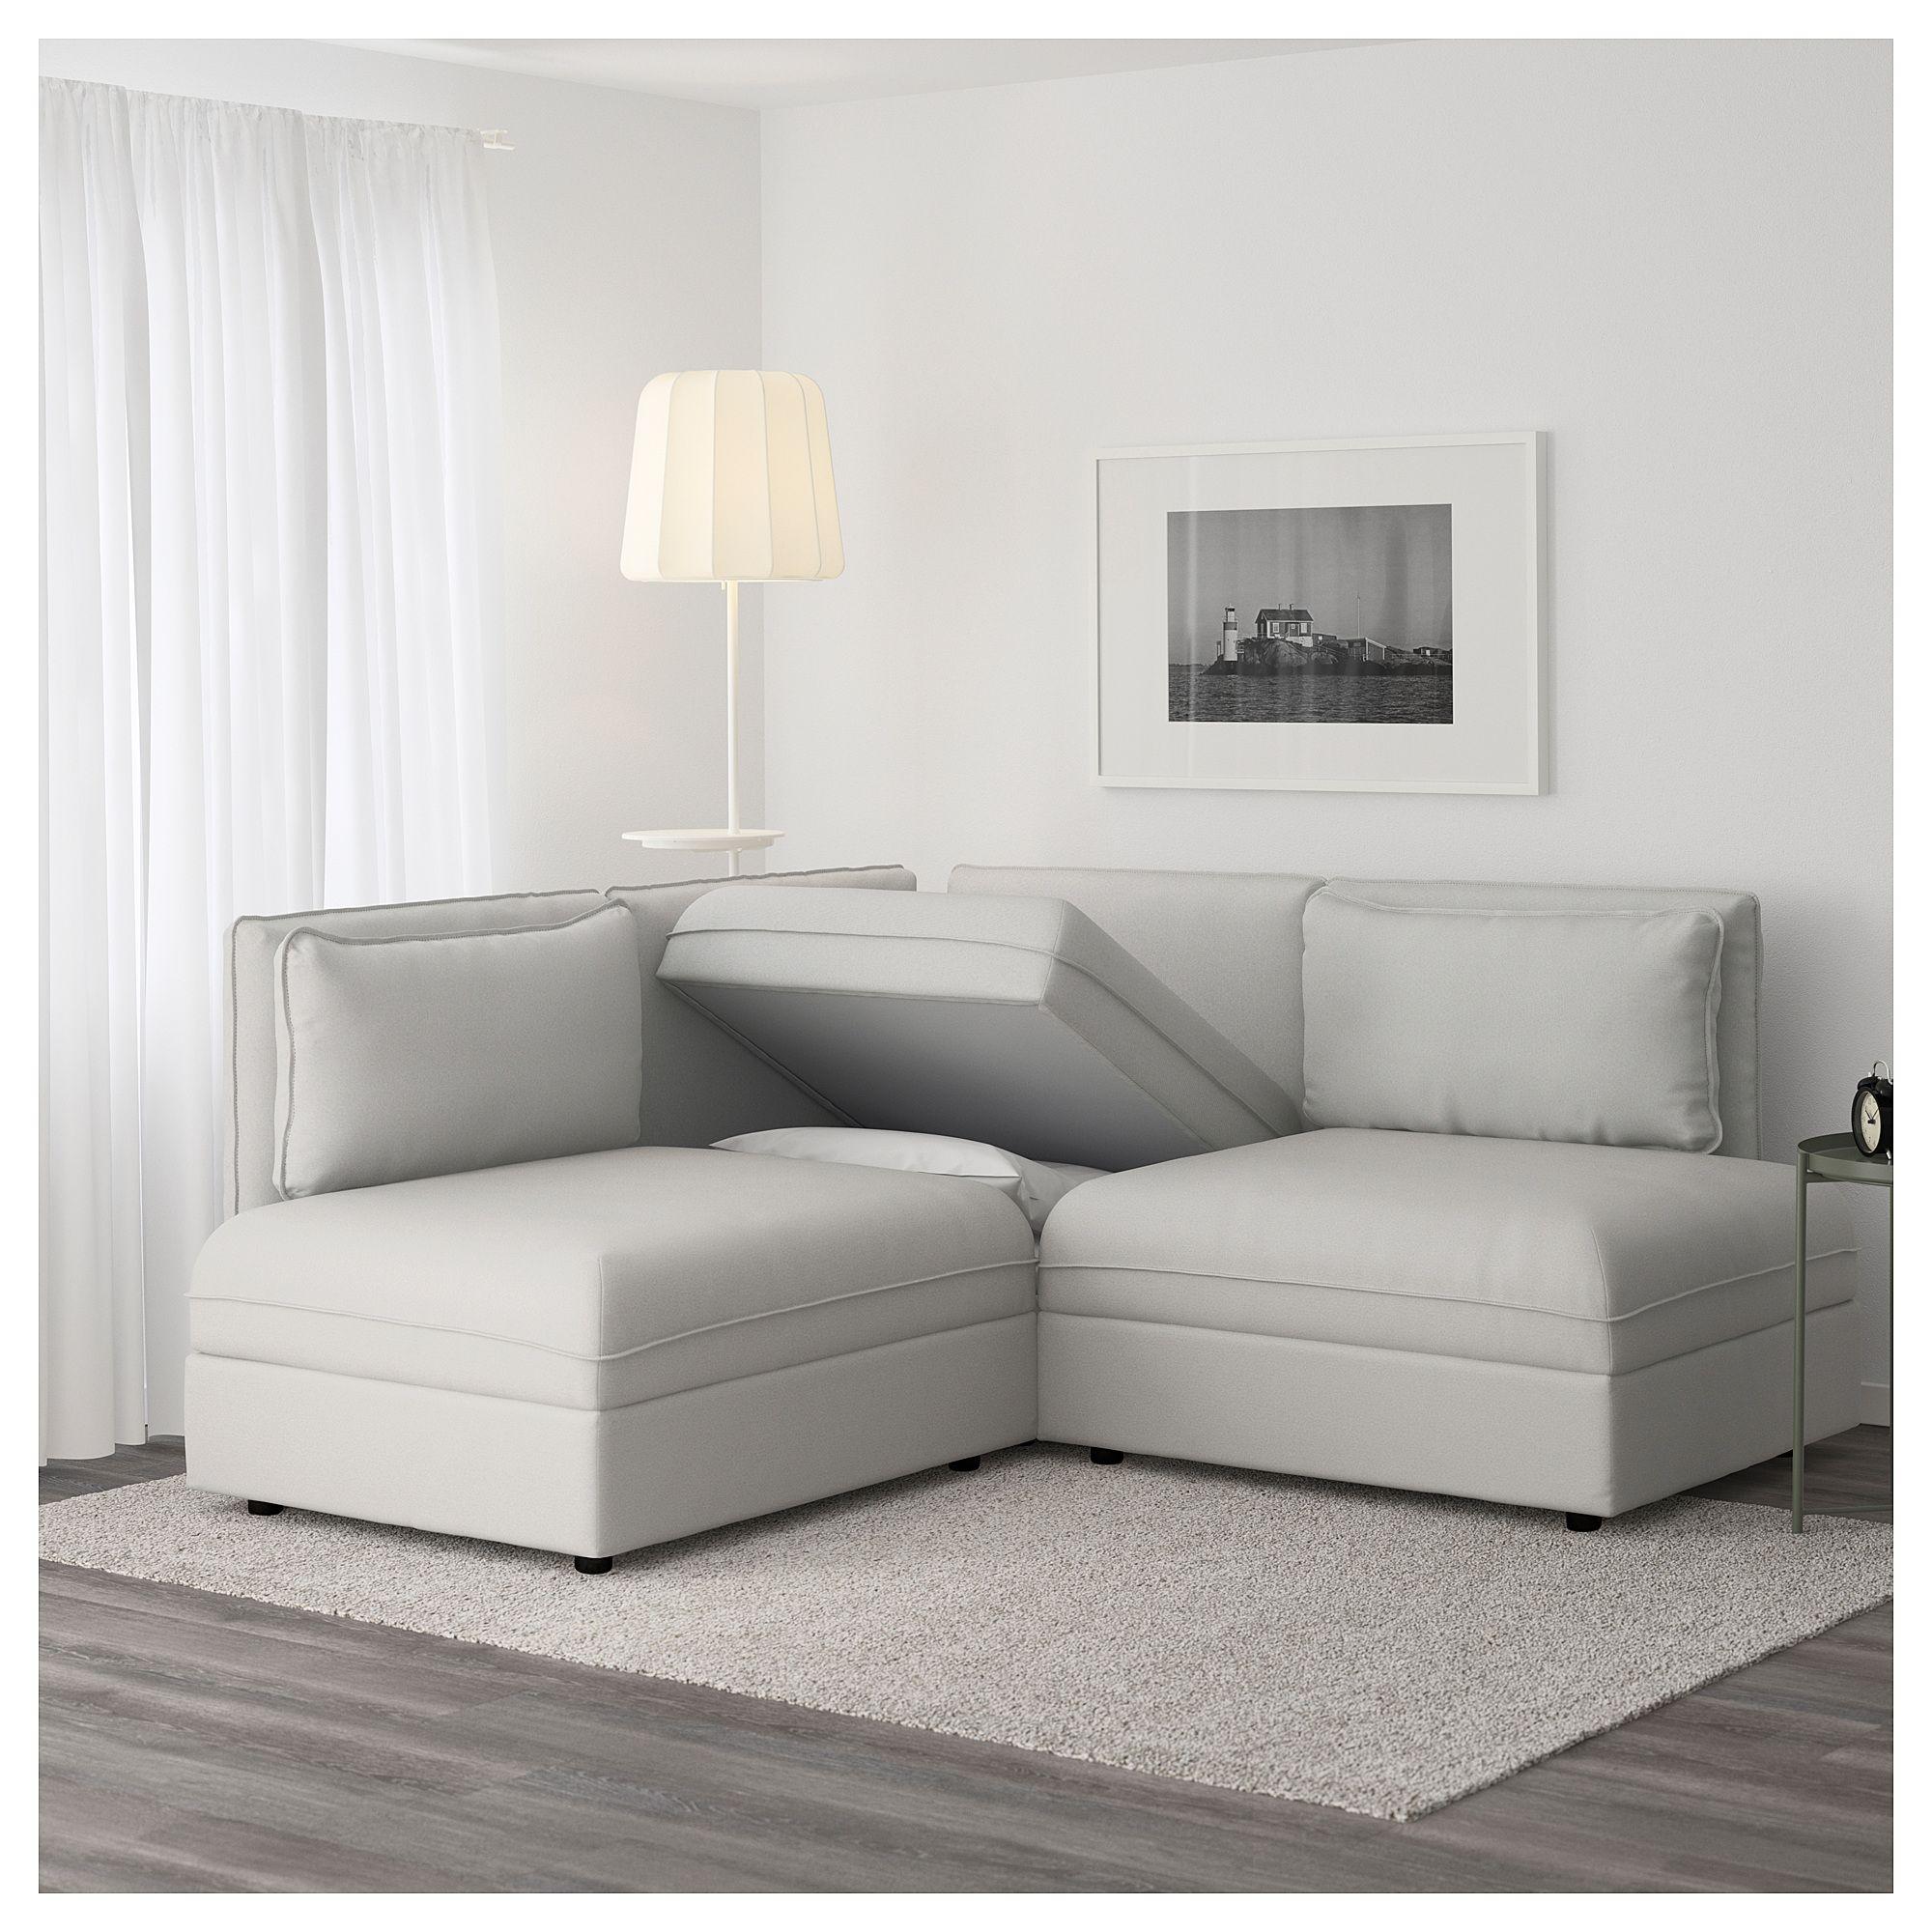 Furniture and Home Furnishings | Corner sofa, Sofa bed with